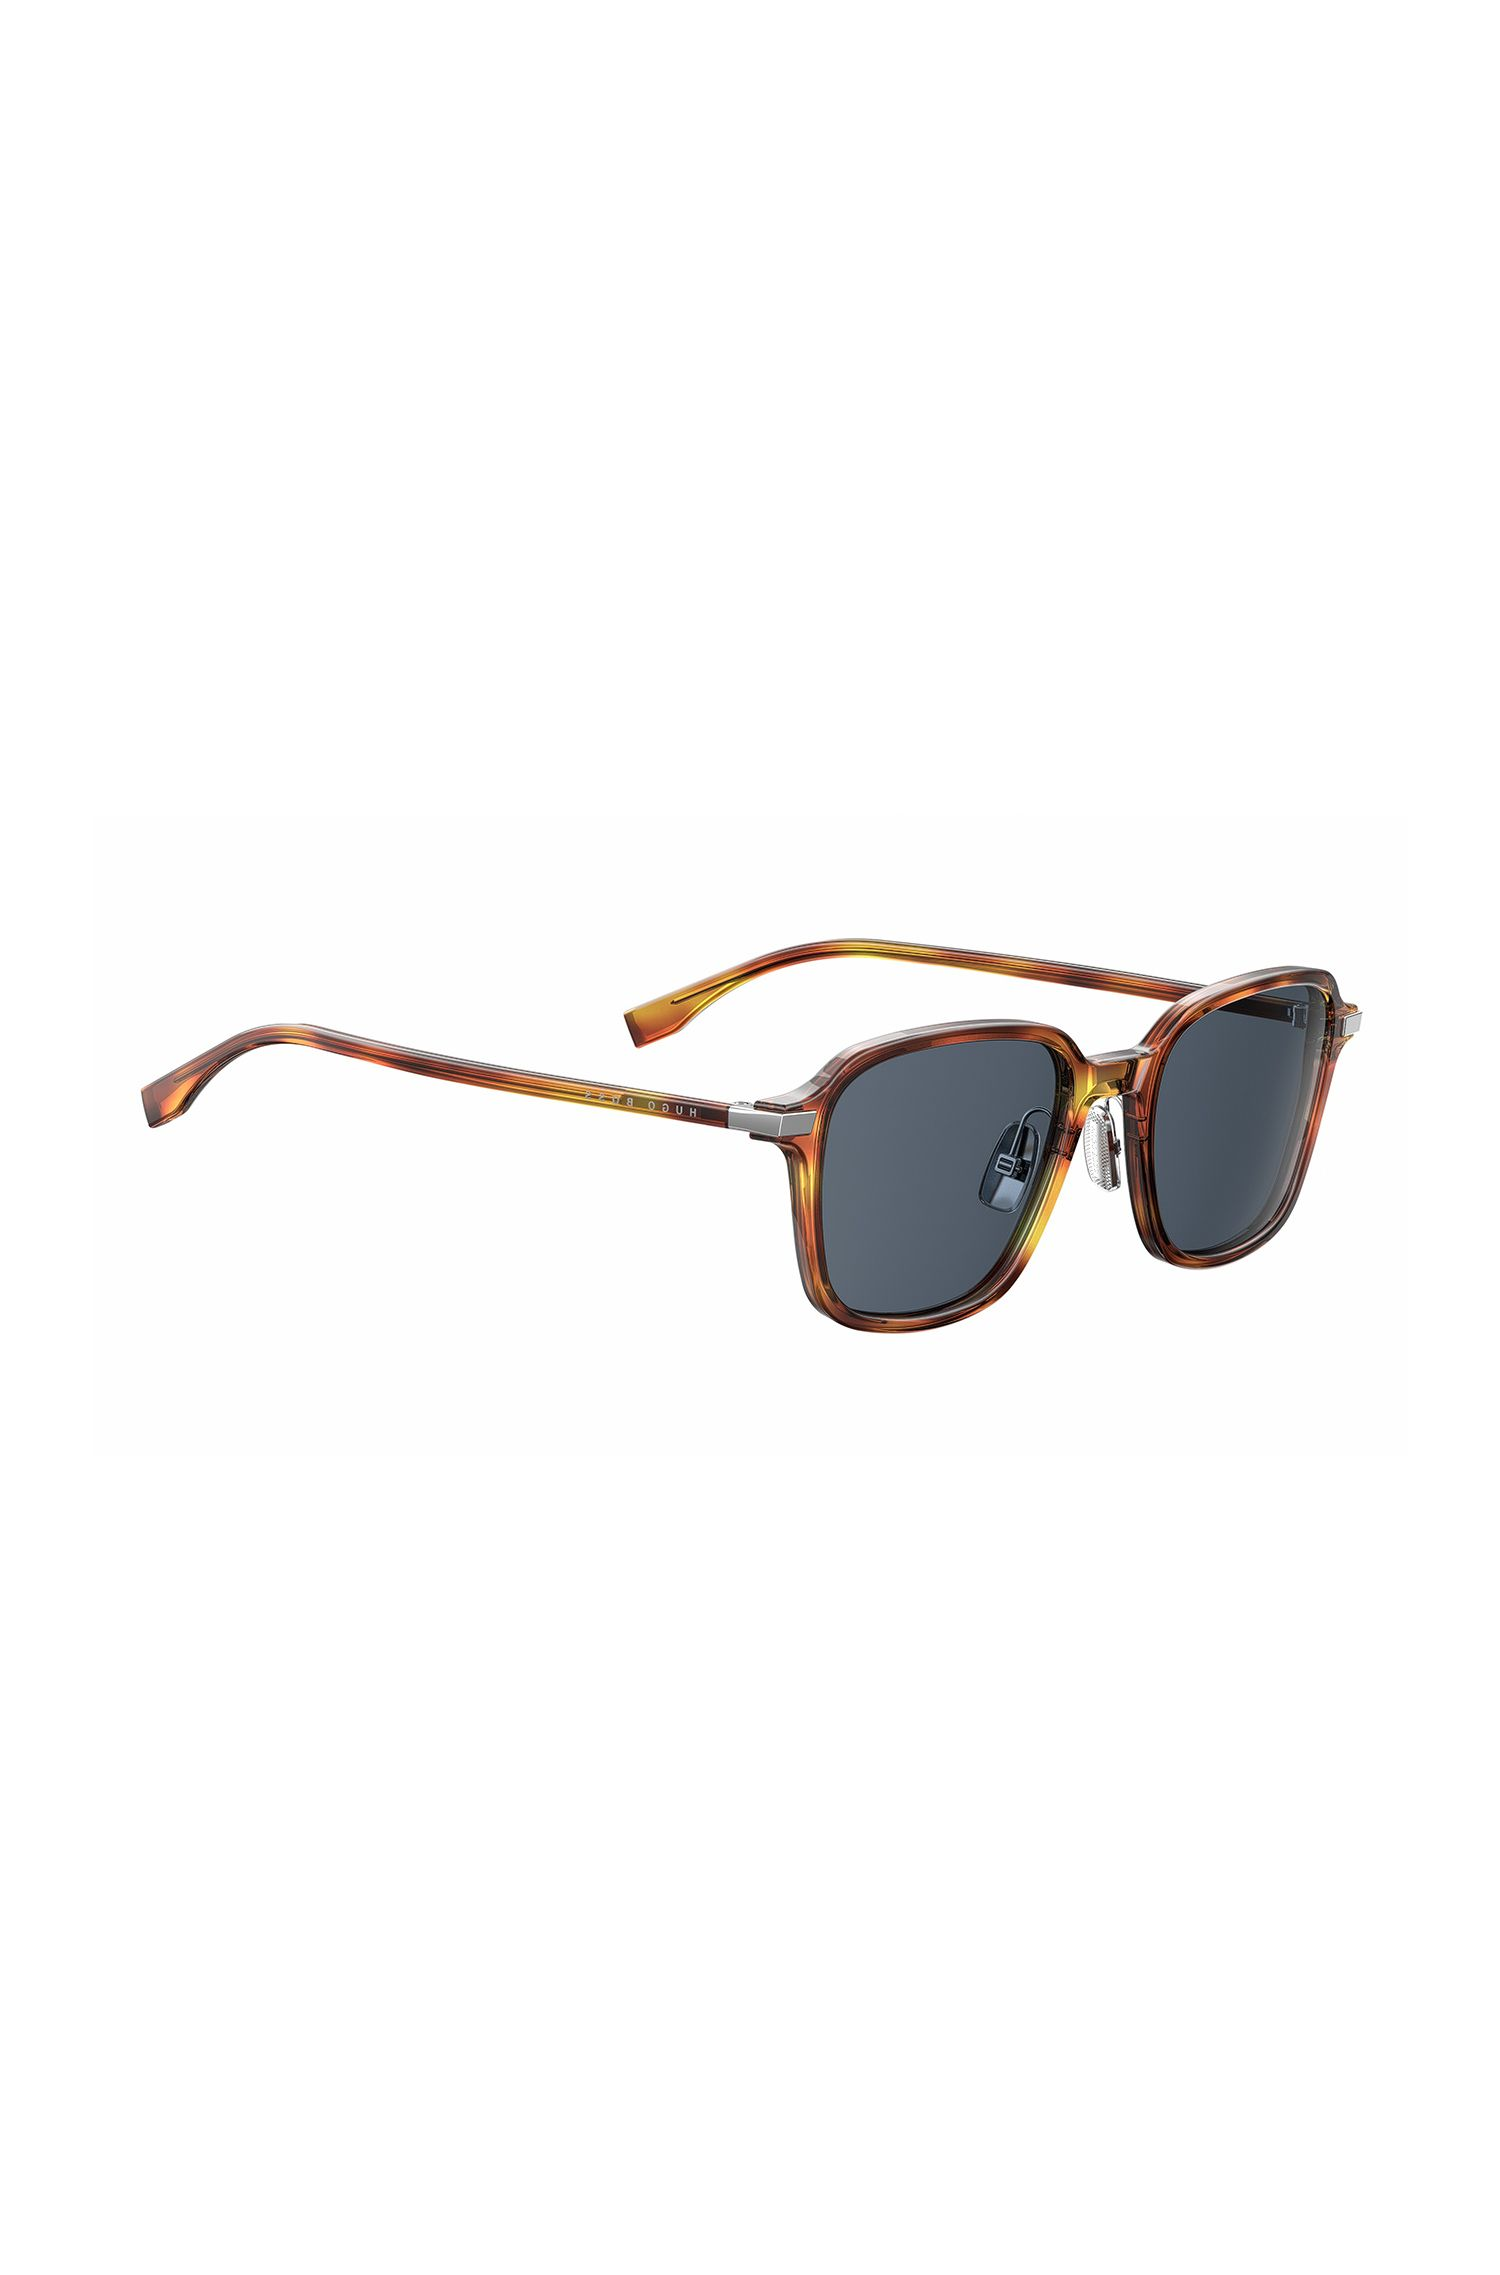 Black Lens Havana Square Sunglasses | BOSS 0909S, Assorted-Pre-Pack